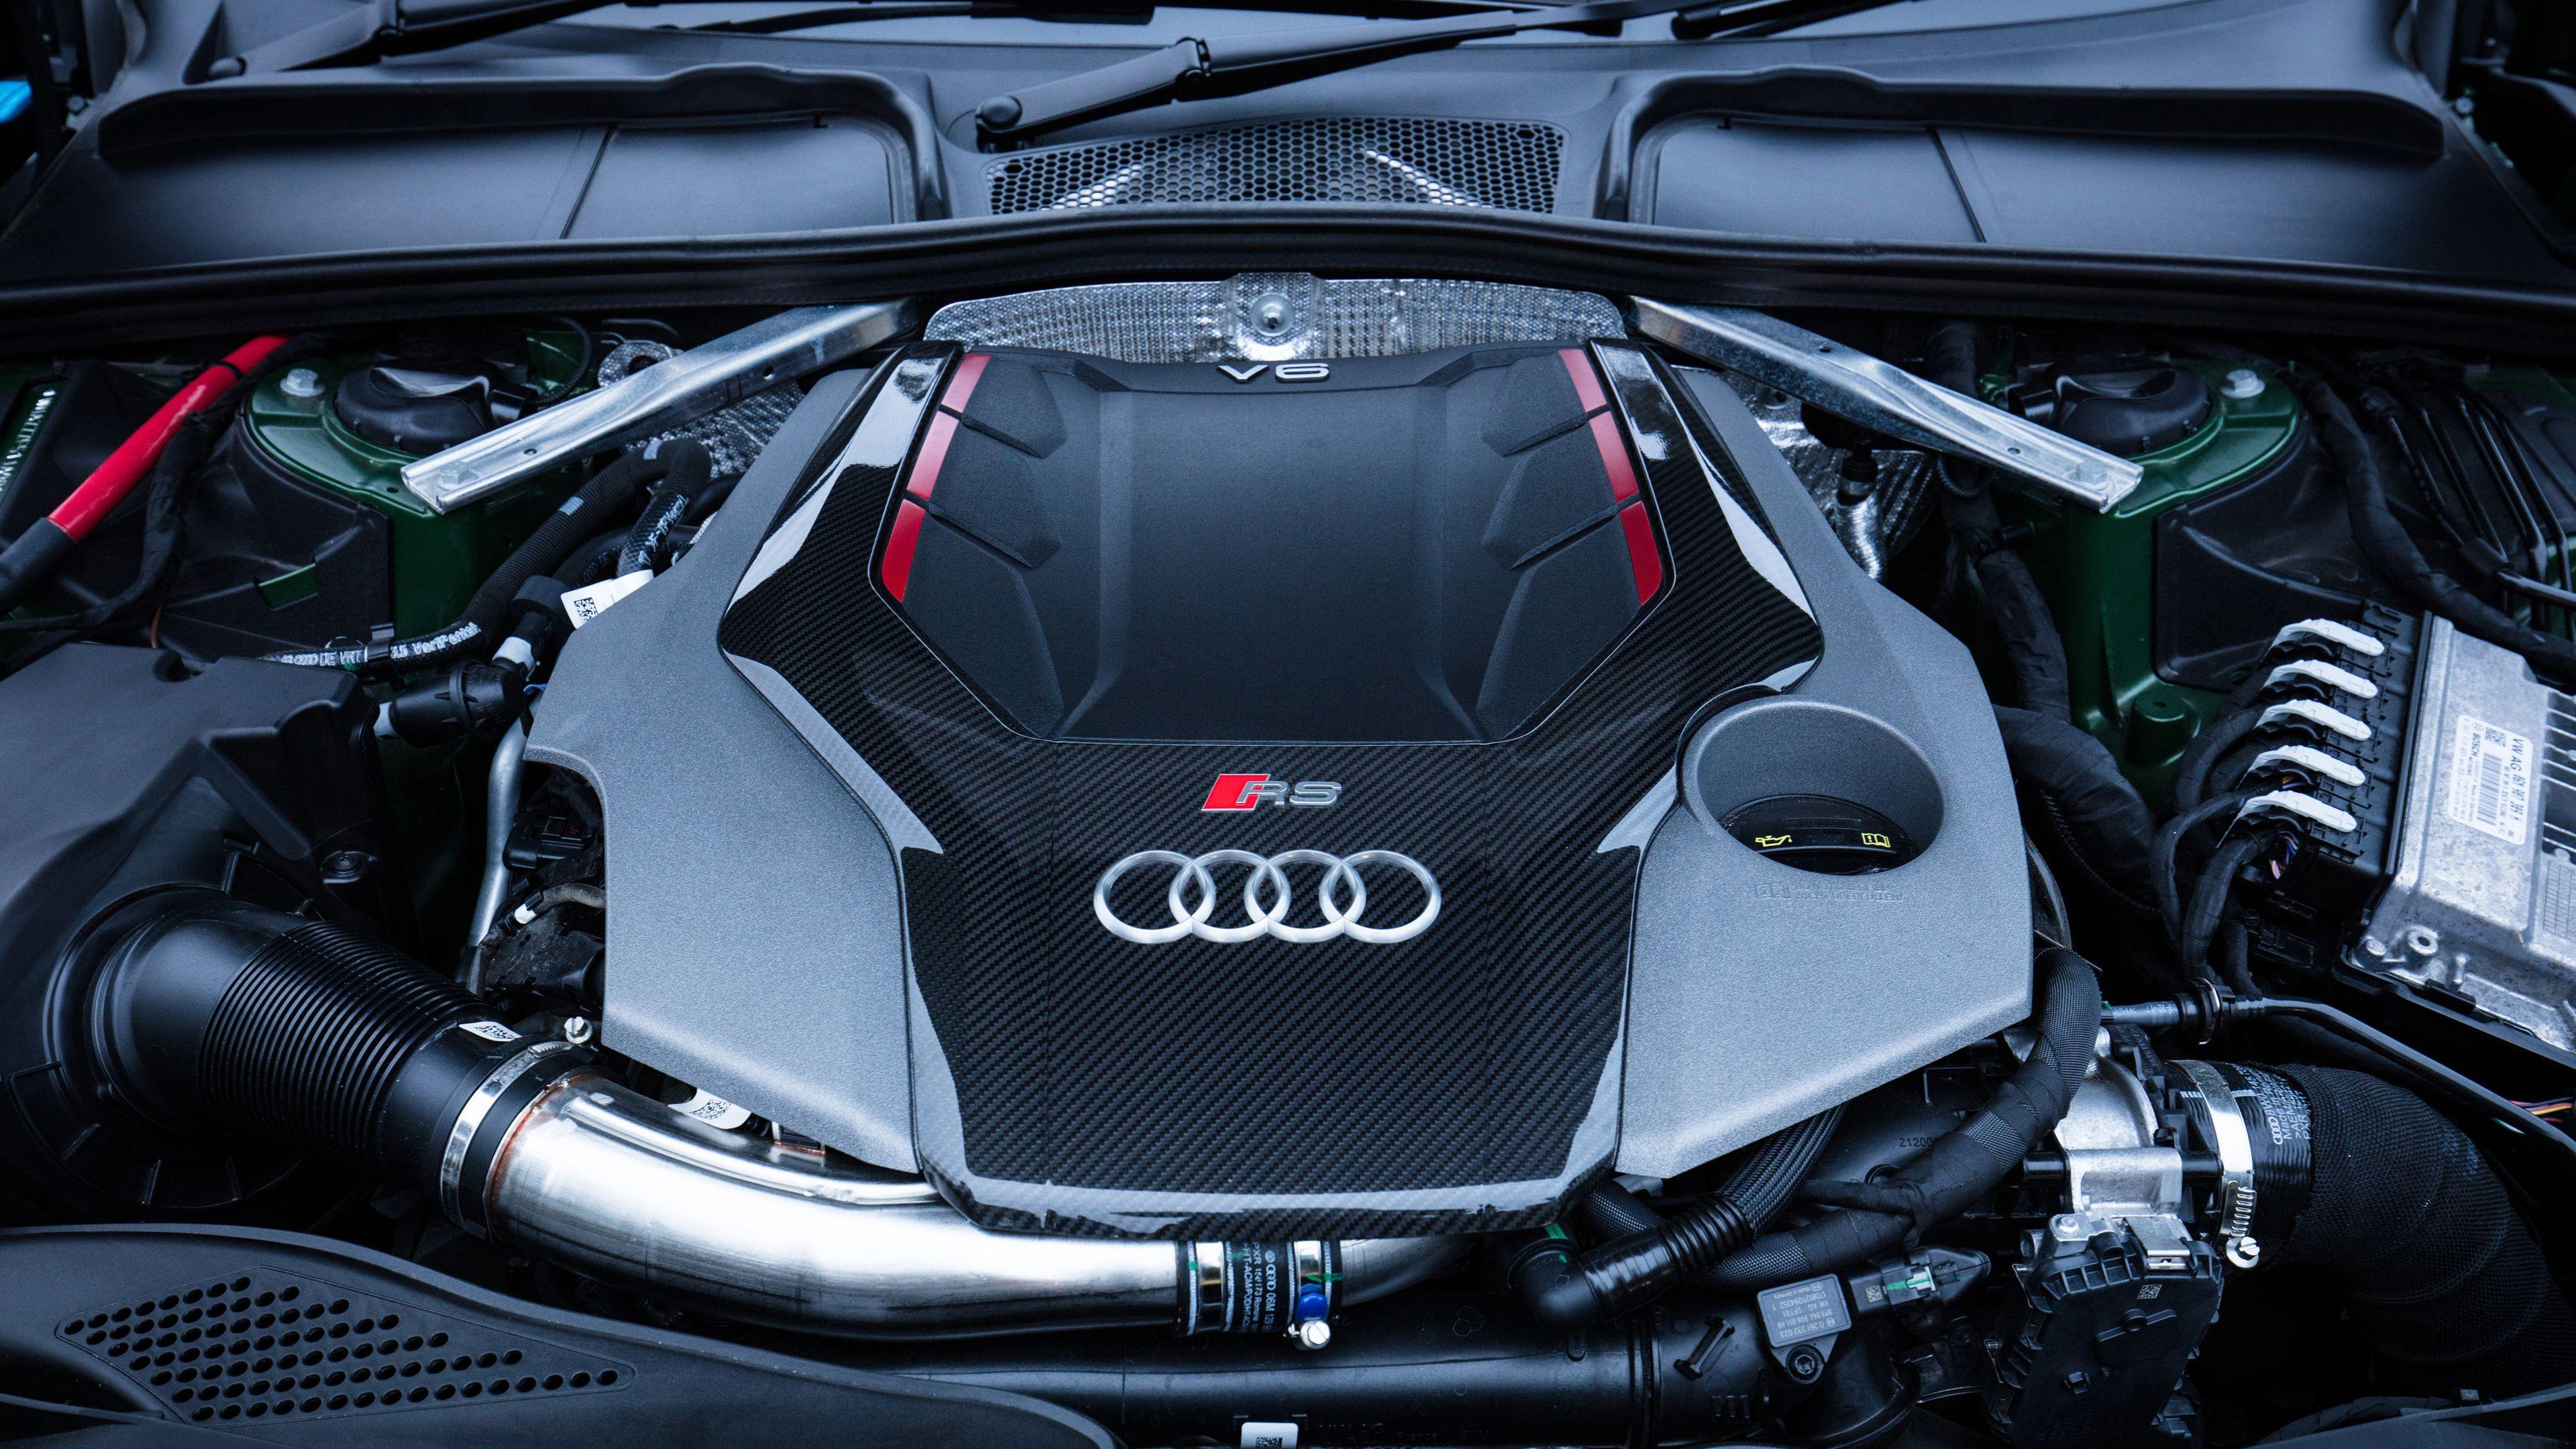 Audi Rs5 Engine Speedometer Wallpapers Interior Wallpapers Hd Wallpapers Cars Wallpapers Audi Wallpapers Audi Rs5 Audi Wallpapers Audi Rs5 Wallpaper Audi